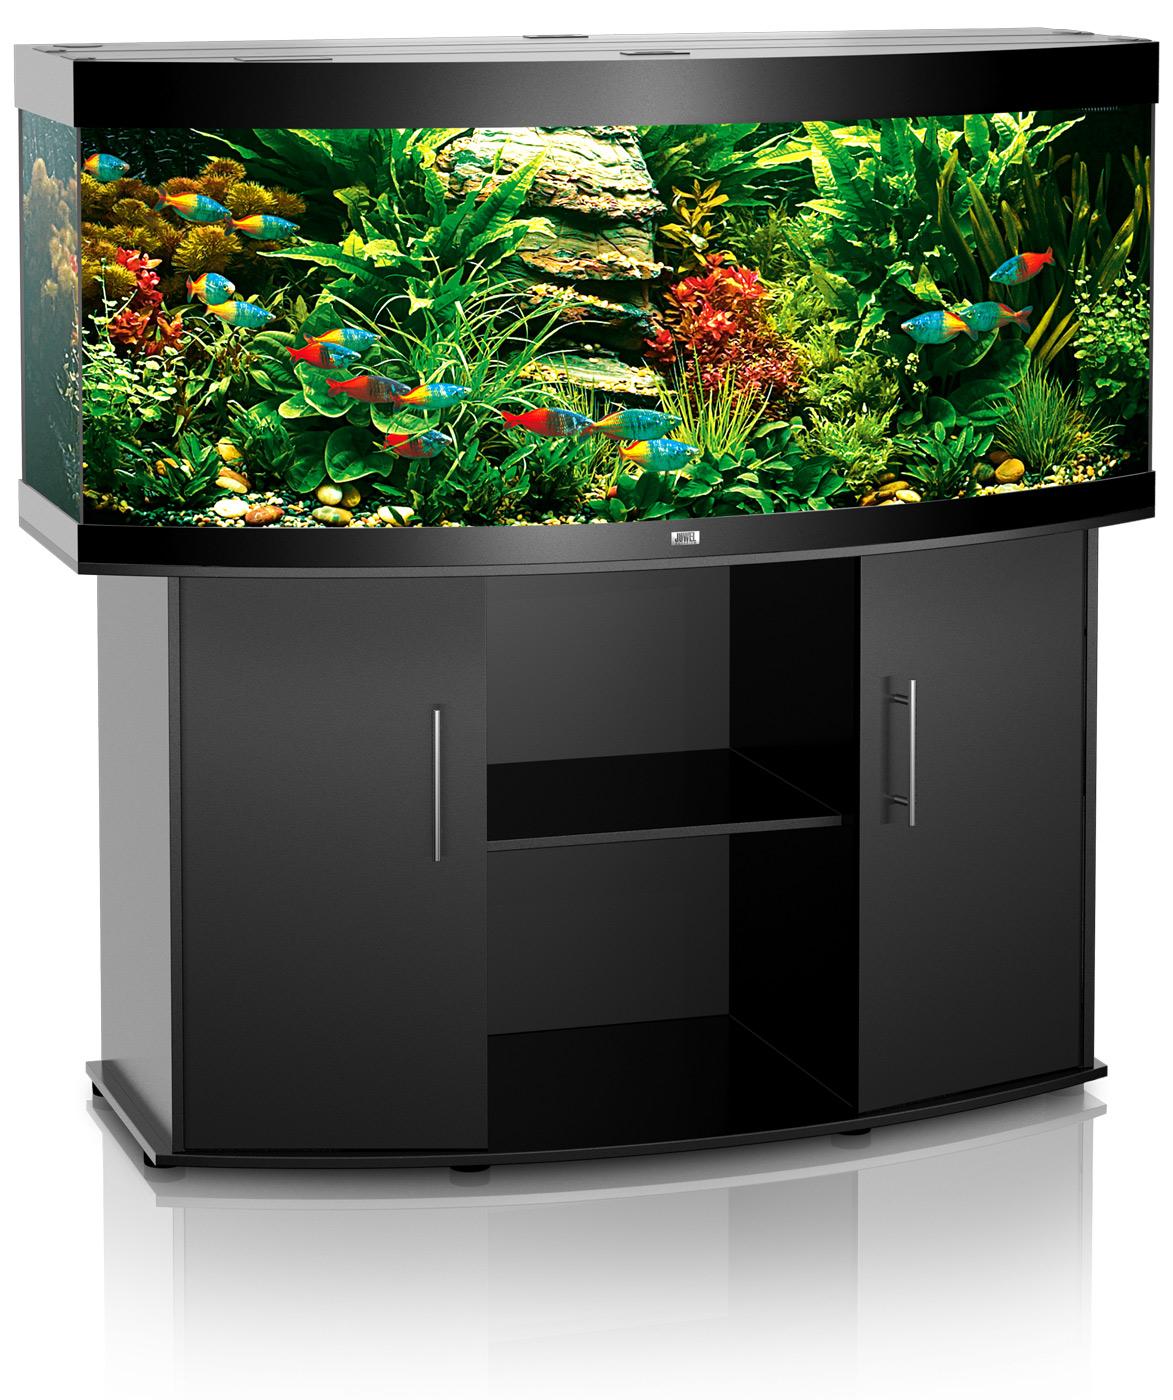 Juwel aquarium fish tank - Juwel Vision 450 Aquarium And Cabinet Vision 450 Black 1243664252